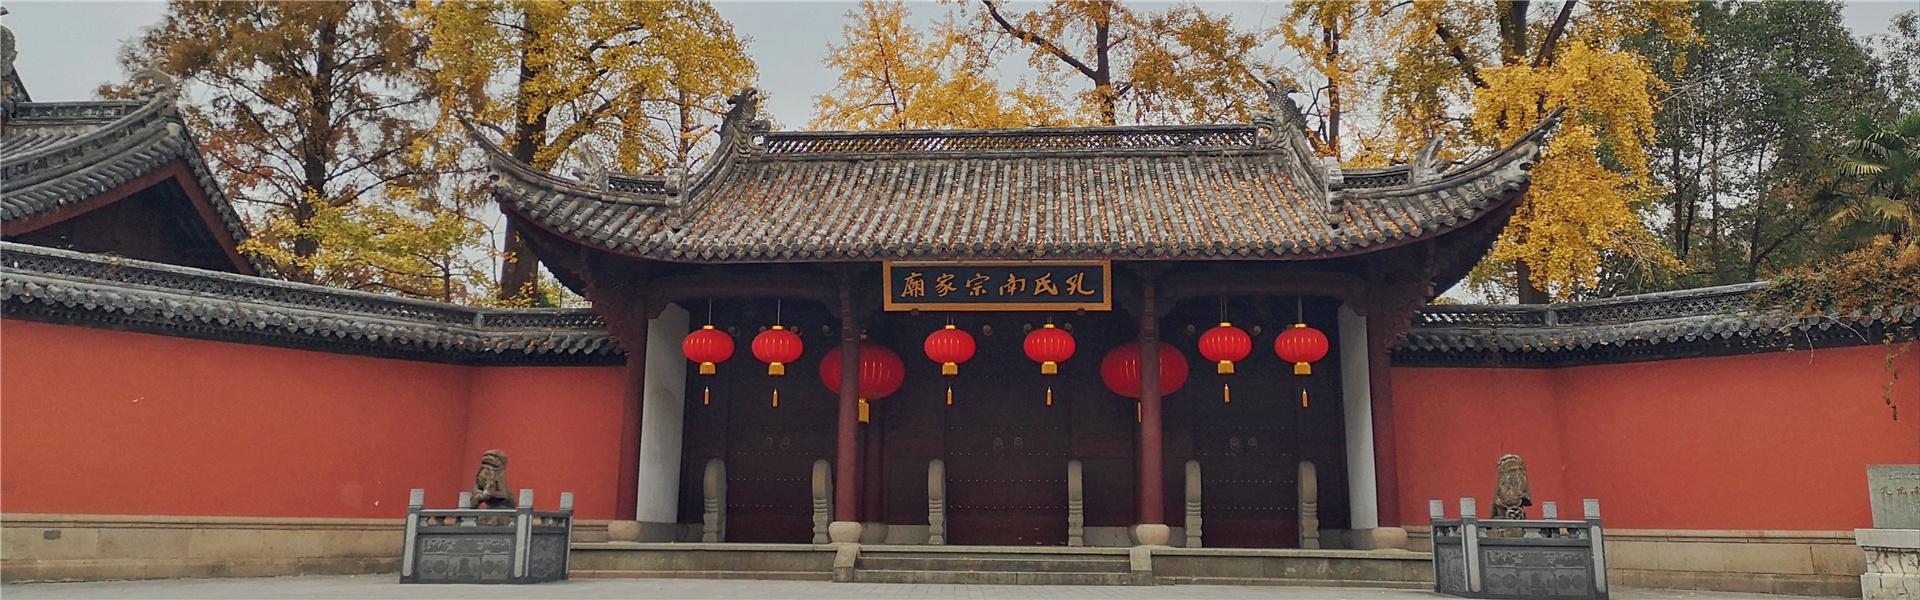 Confucius birthday celebrated in Zhejiang